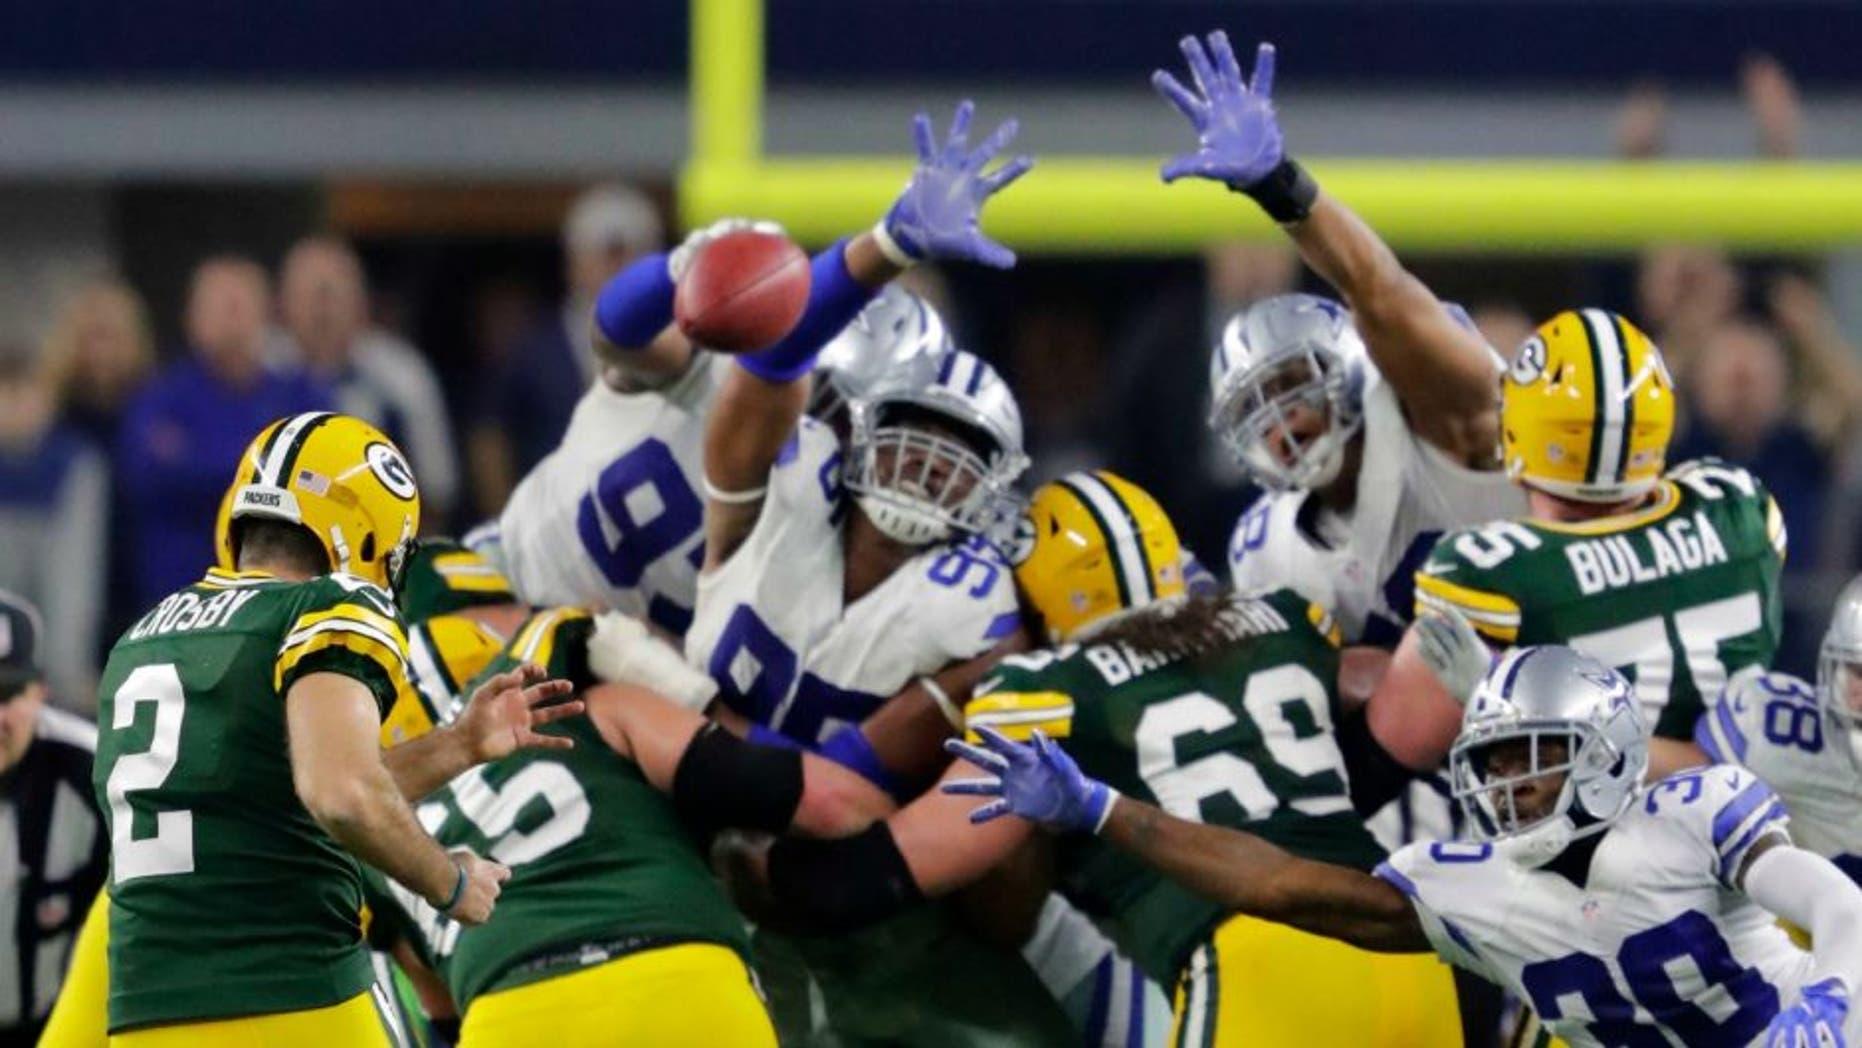 Jan 15, 2017; Arlington, TX, USA; Green Bay Packers kicker Mason Crosby (2) kicks the game winning field goal against the Dallas Cowboys in the NFC Divisional playoff game at AT&T Stadium. Mandatory Credit: Dan Powers/The Post-Crescant via USA TODAY NETWORK